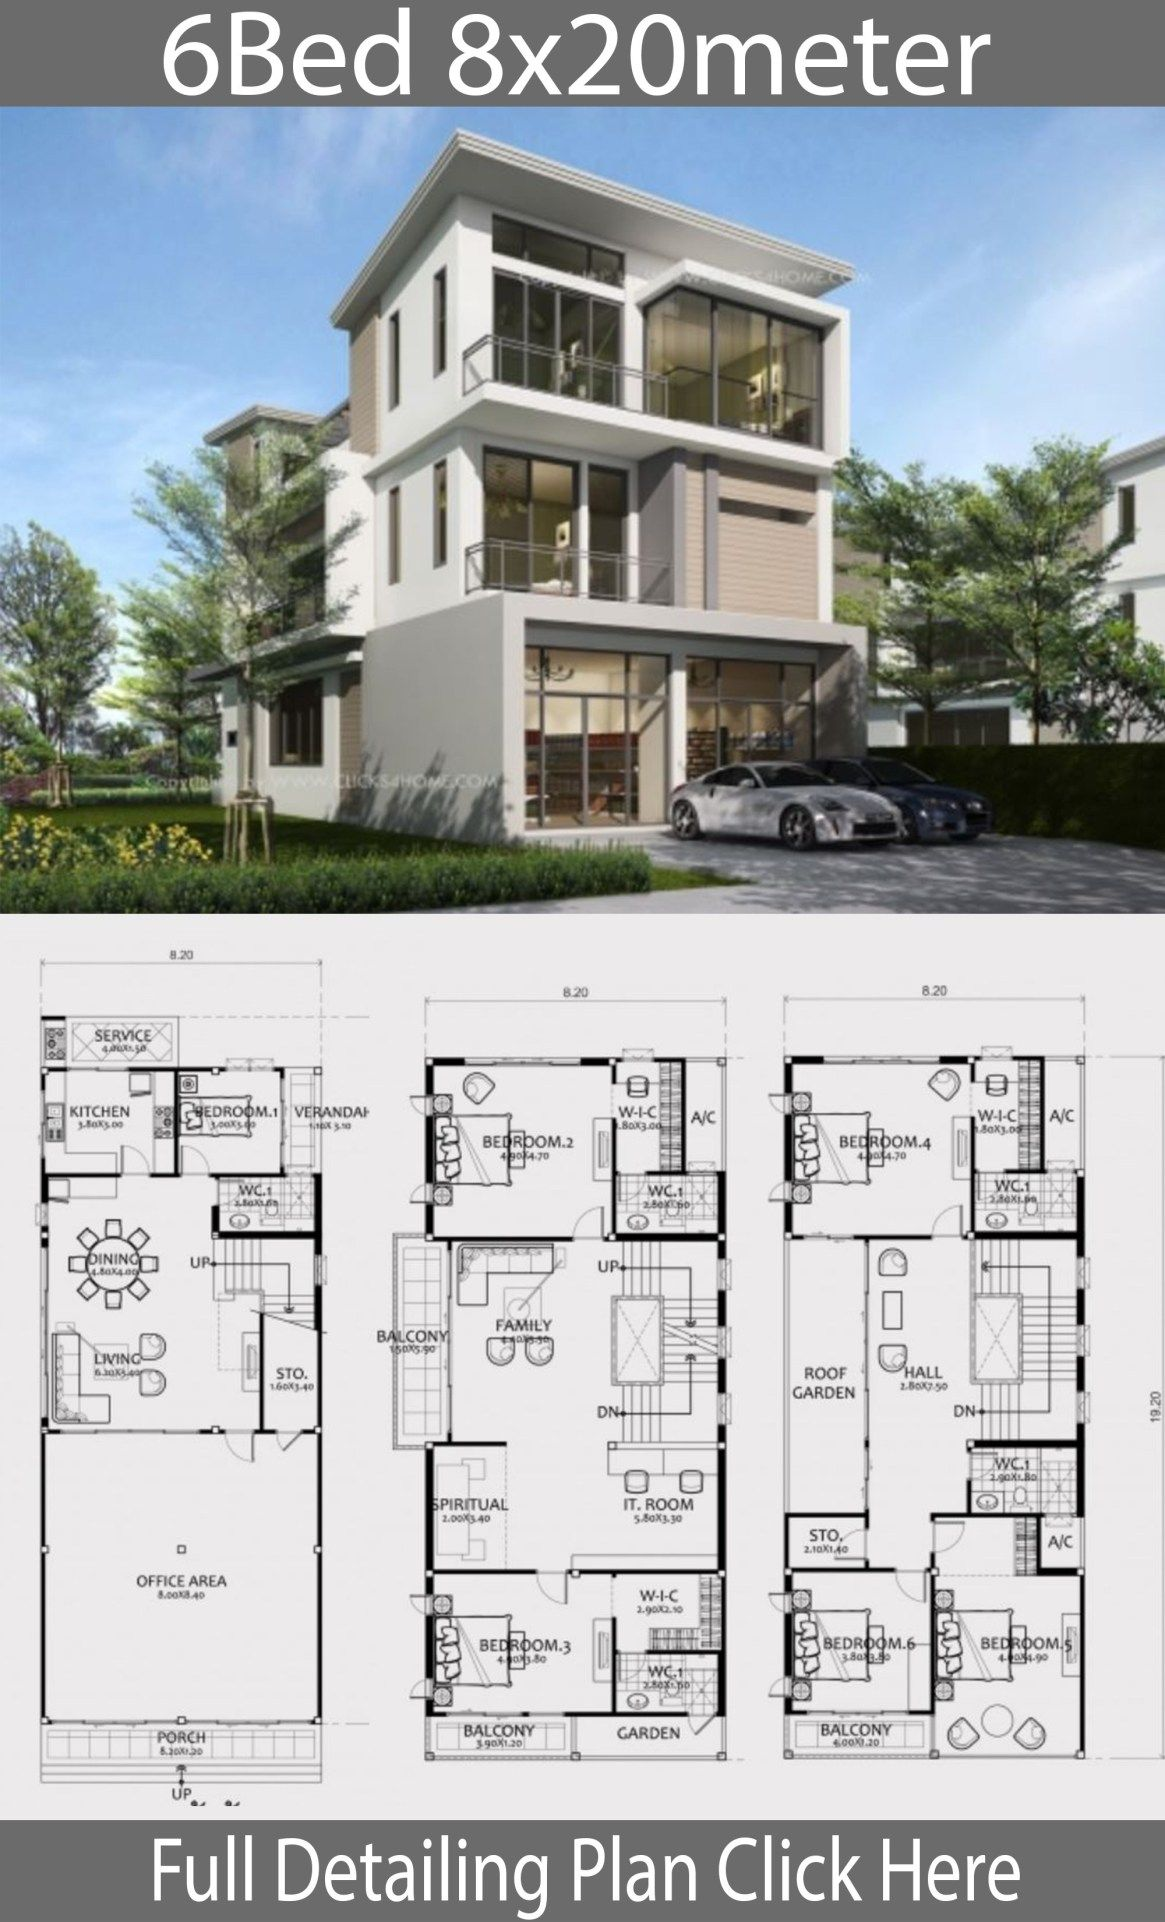 Home Design Plan 8x20m With 6 Bedrooms Architectural House Plans Architecture Model House Home Building Design